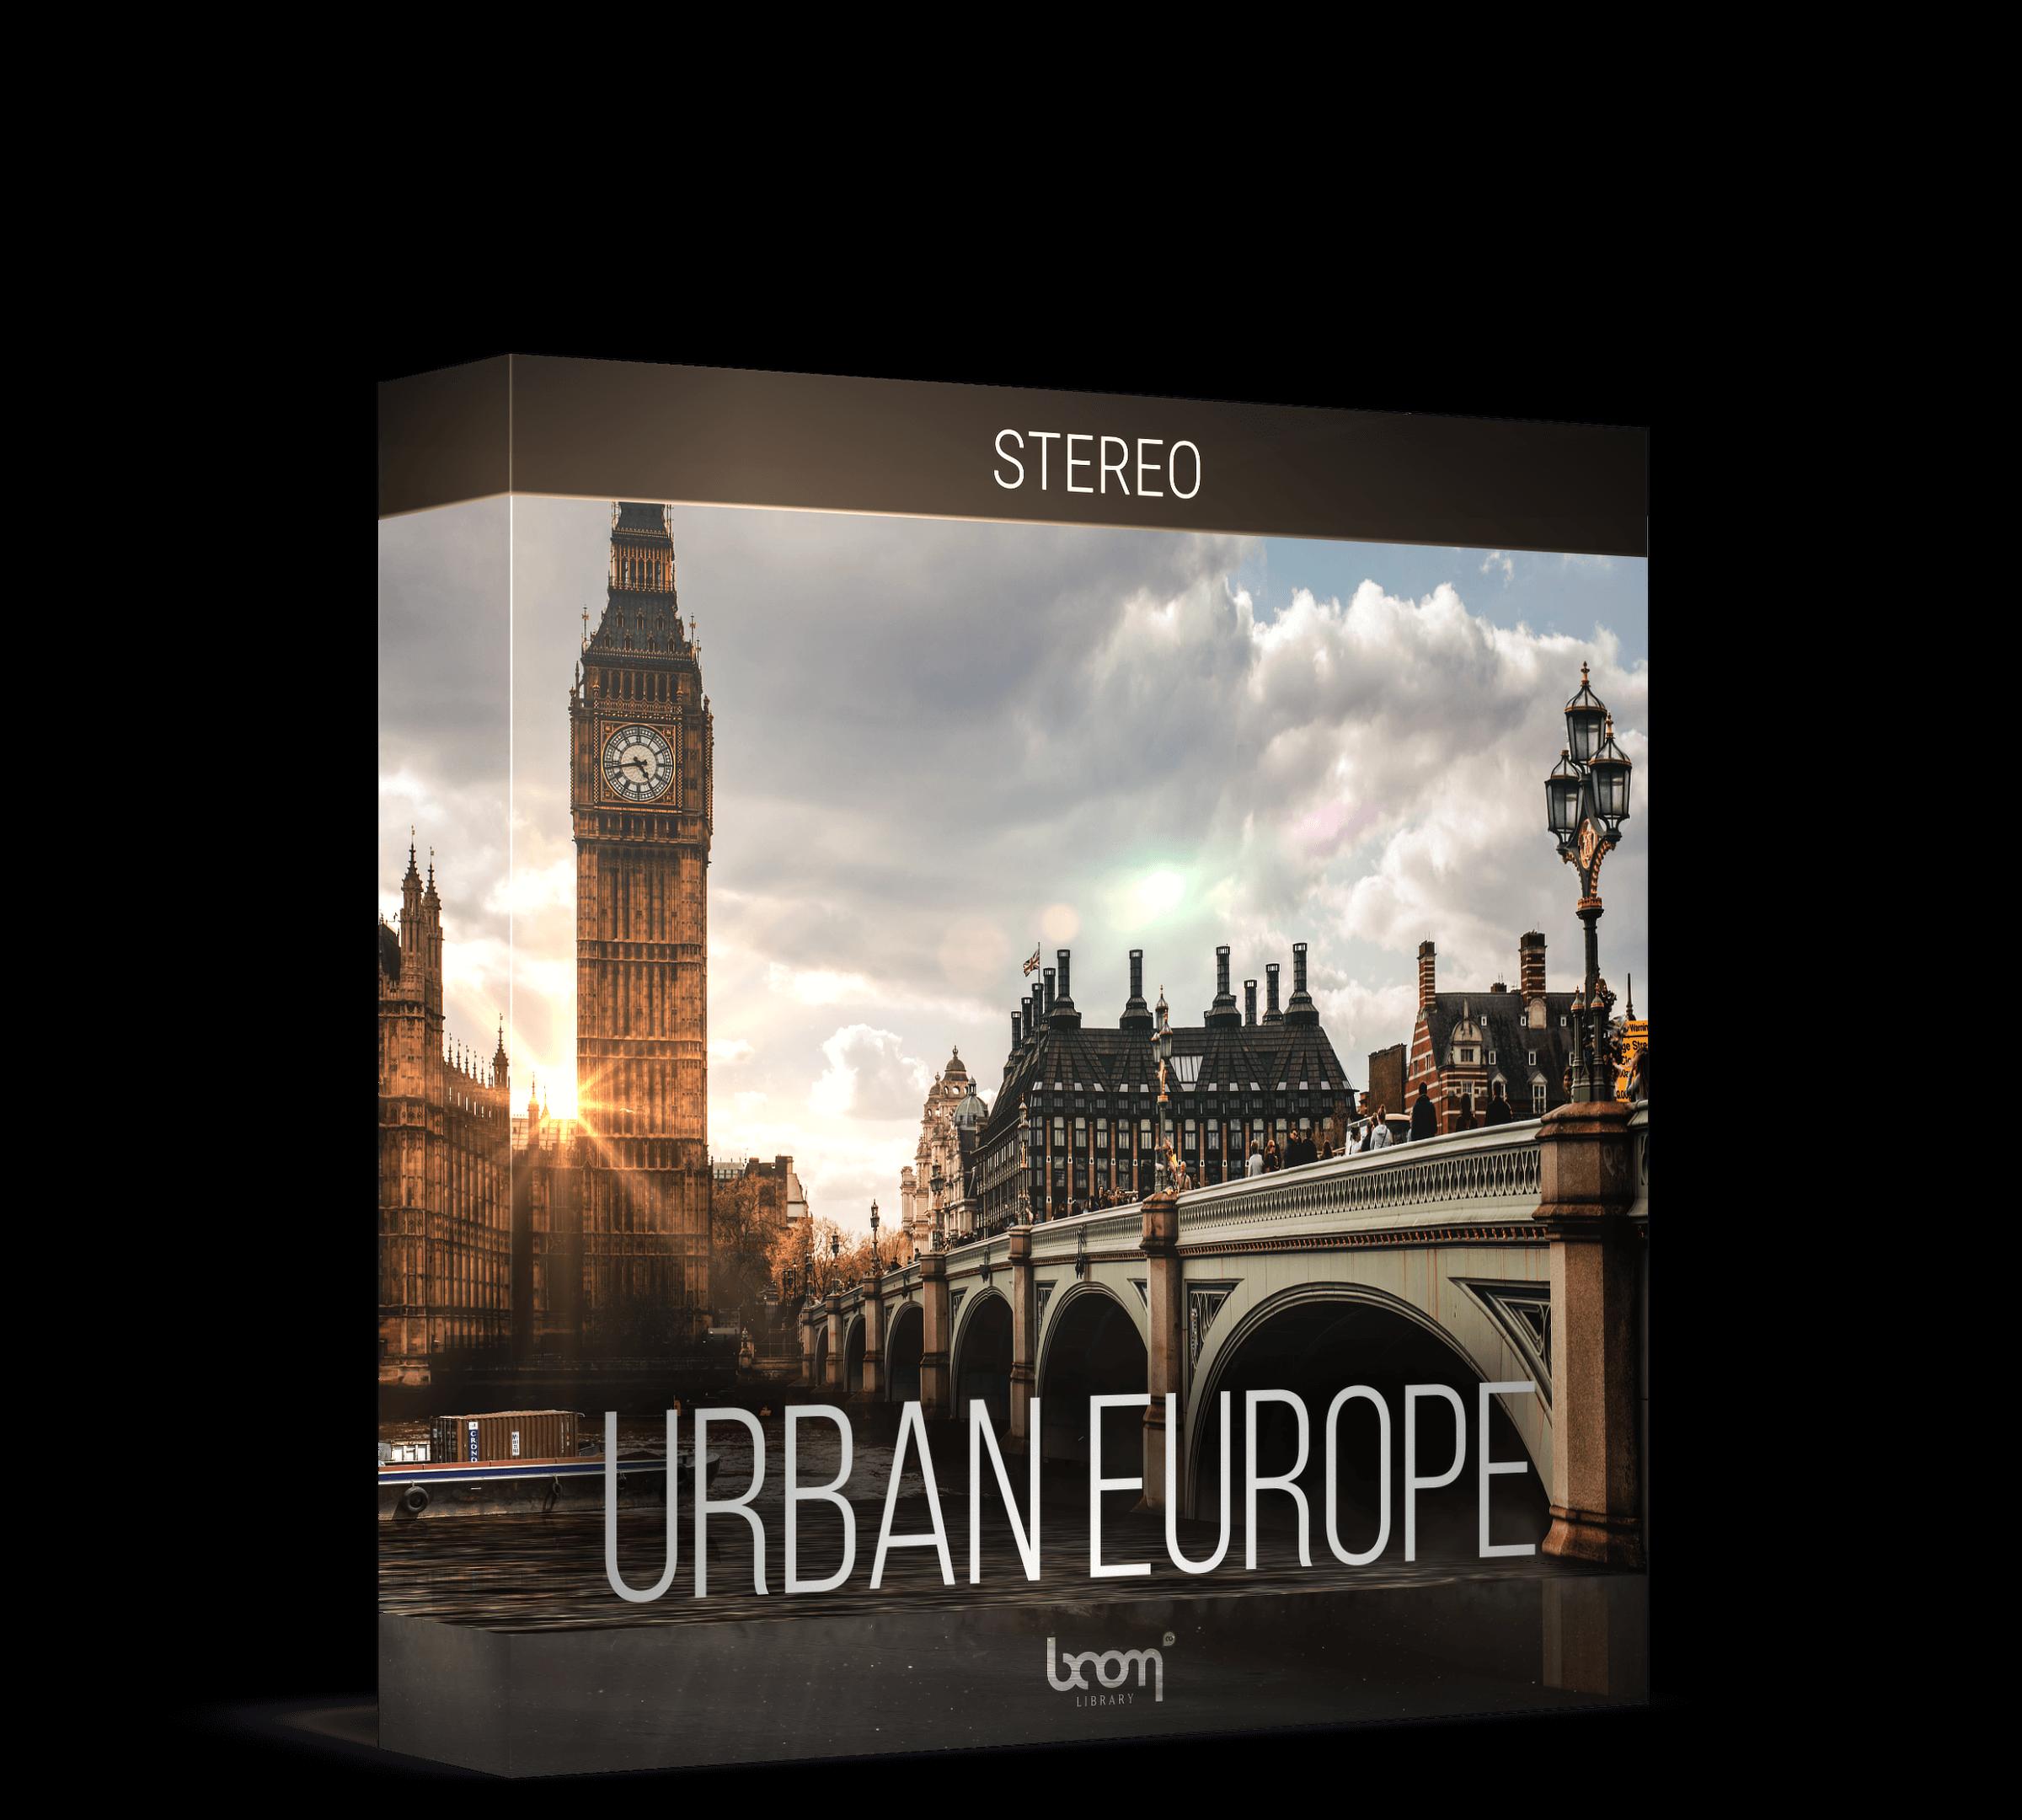 Urban Europe Stereo Artwork